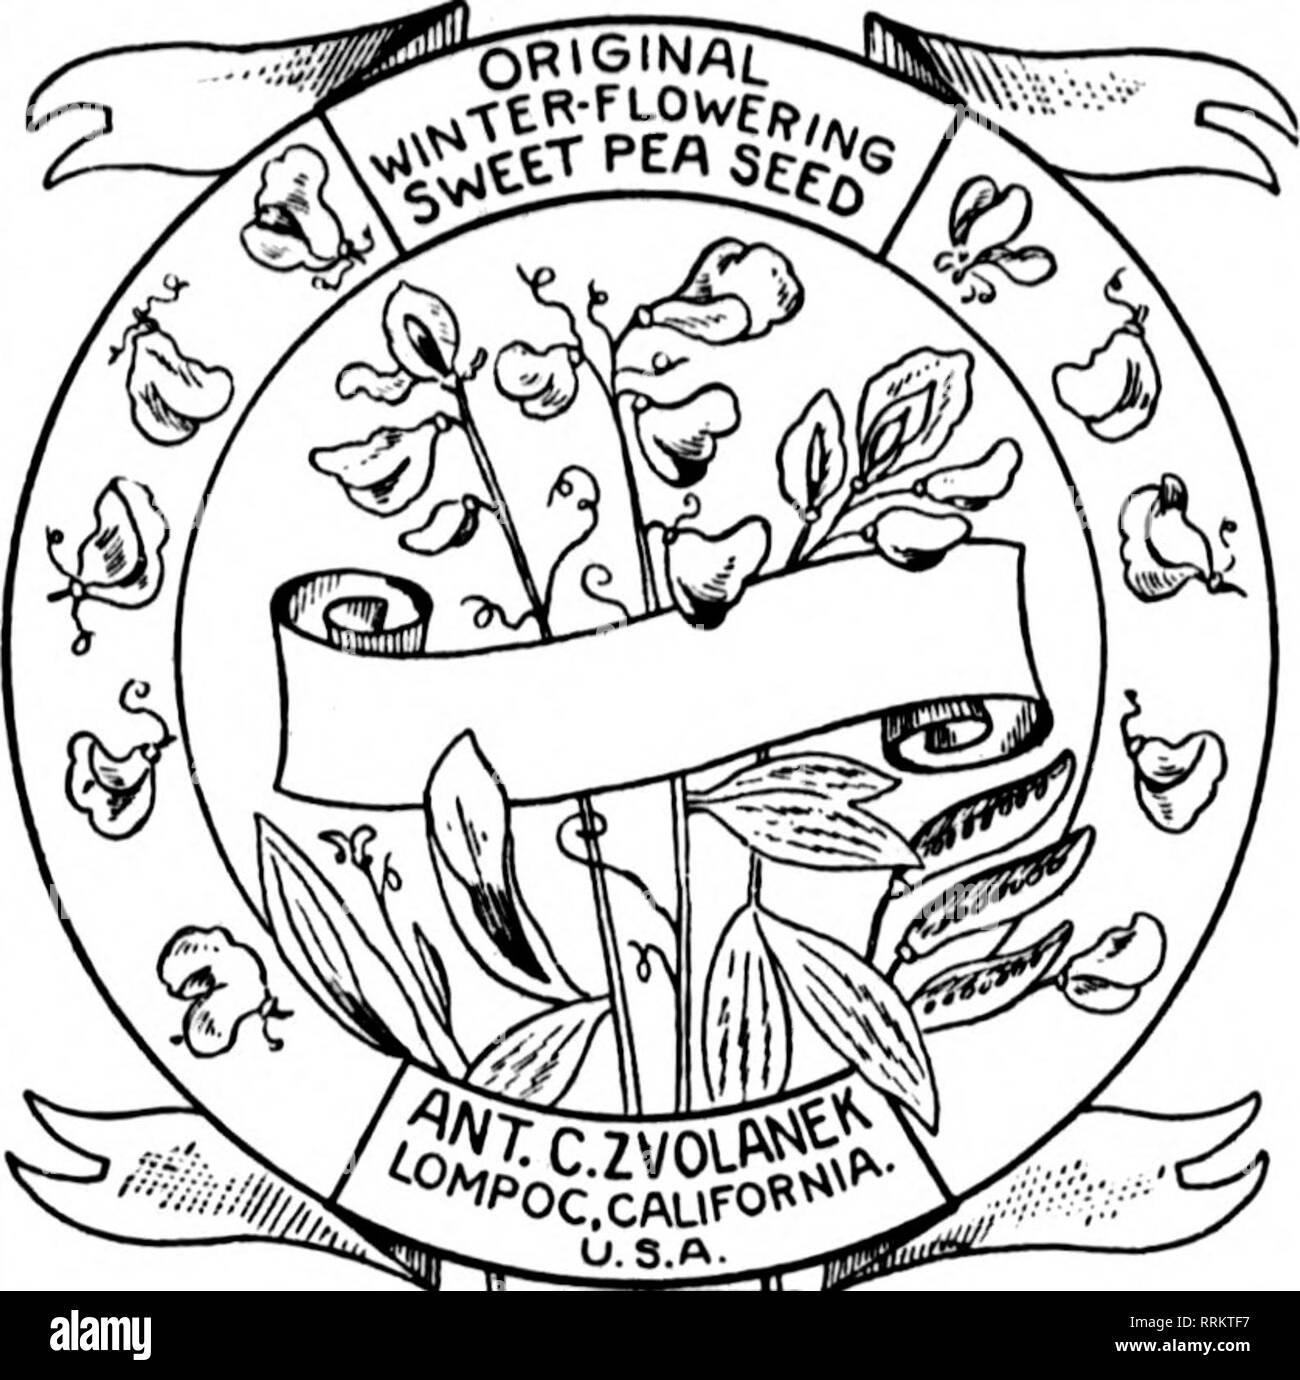 Florists' review [microform]  Floriculture  Jdnh 7, 1917  The